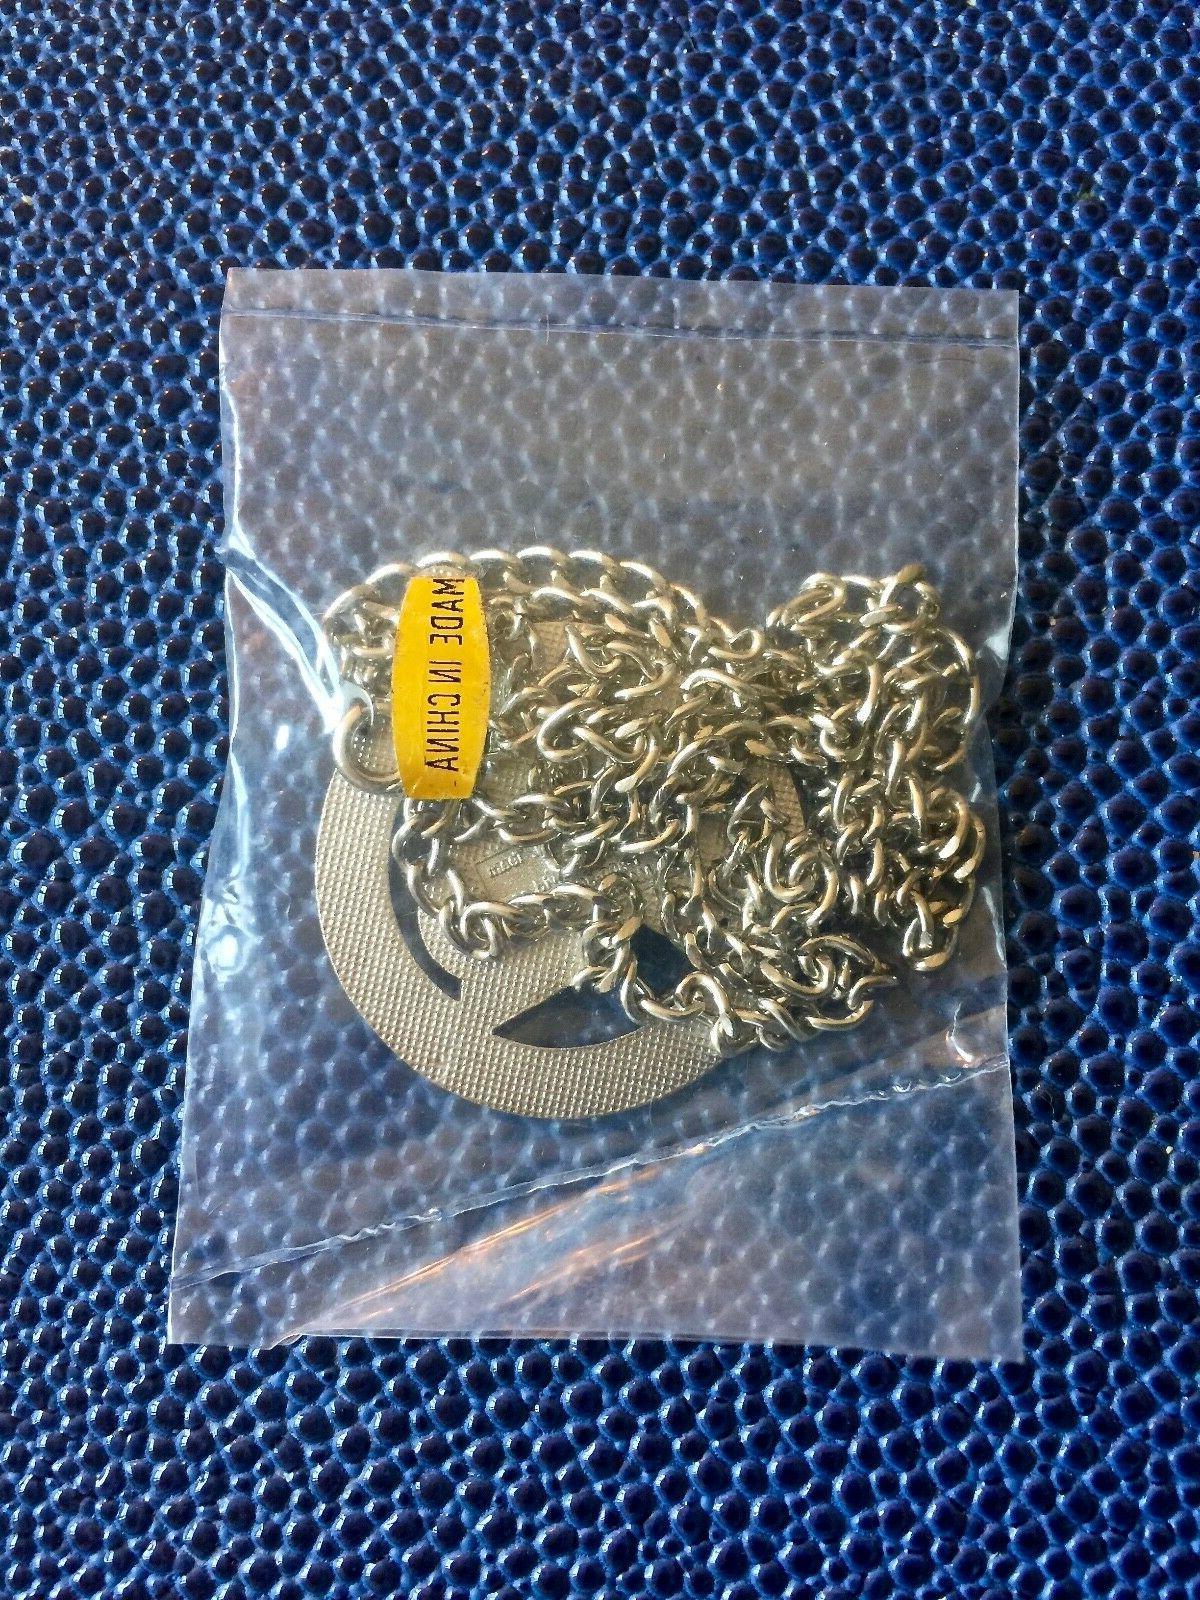 Vintage Hockey Jewelry - Charm Chain